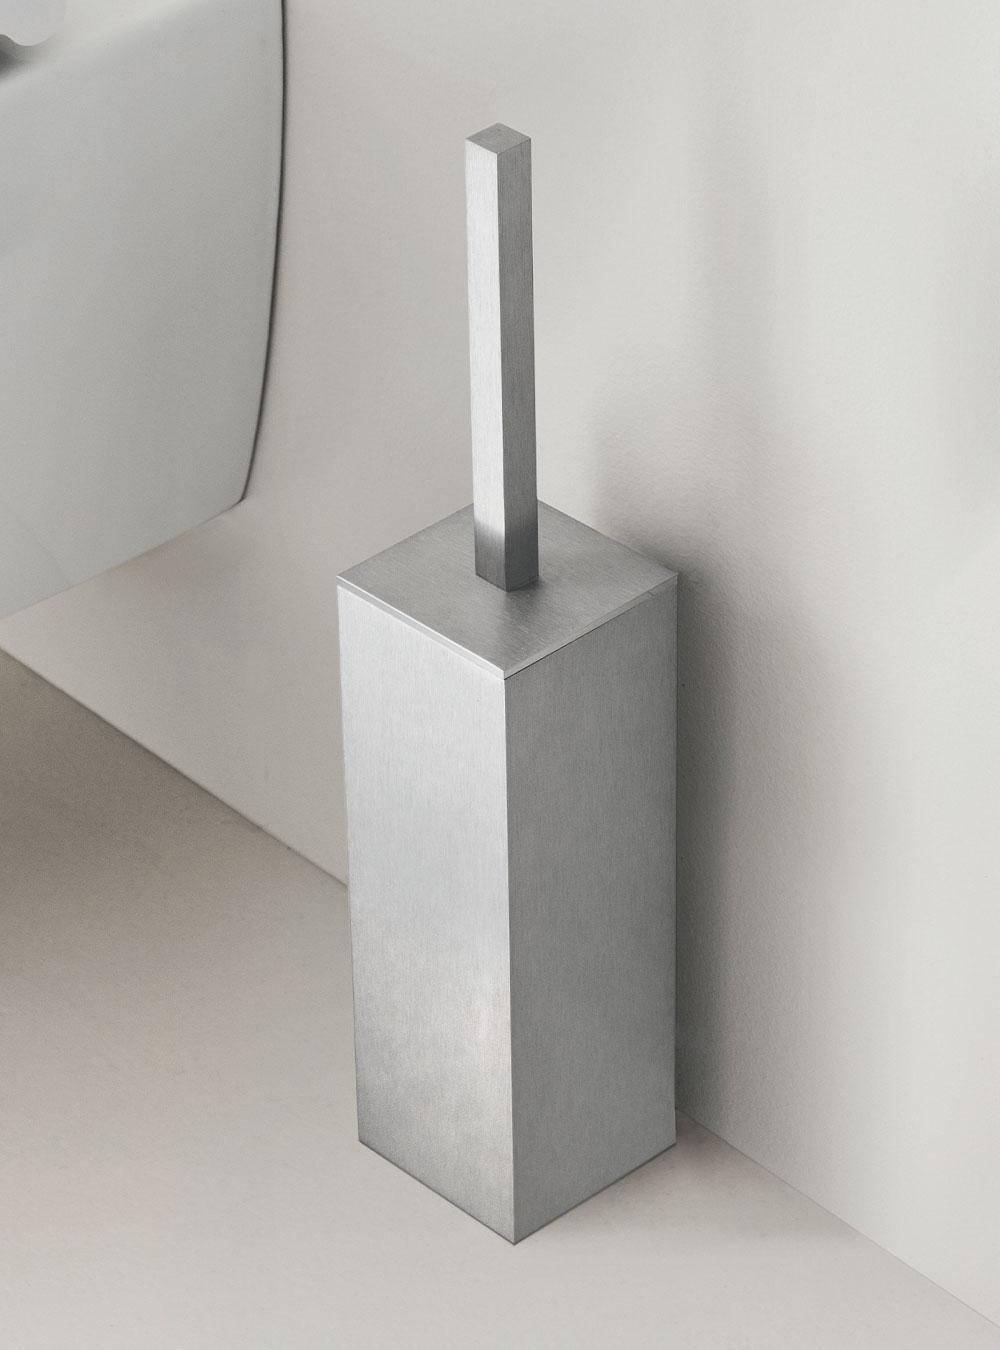 https://www.arbiarredobagno.fr/wp-content/uploads/2021/05/Arbi-Zeus-porta-scopino-inox-spazzolato.jpg